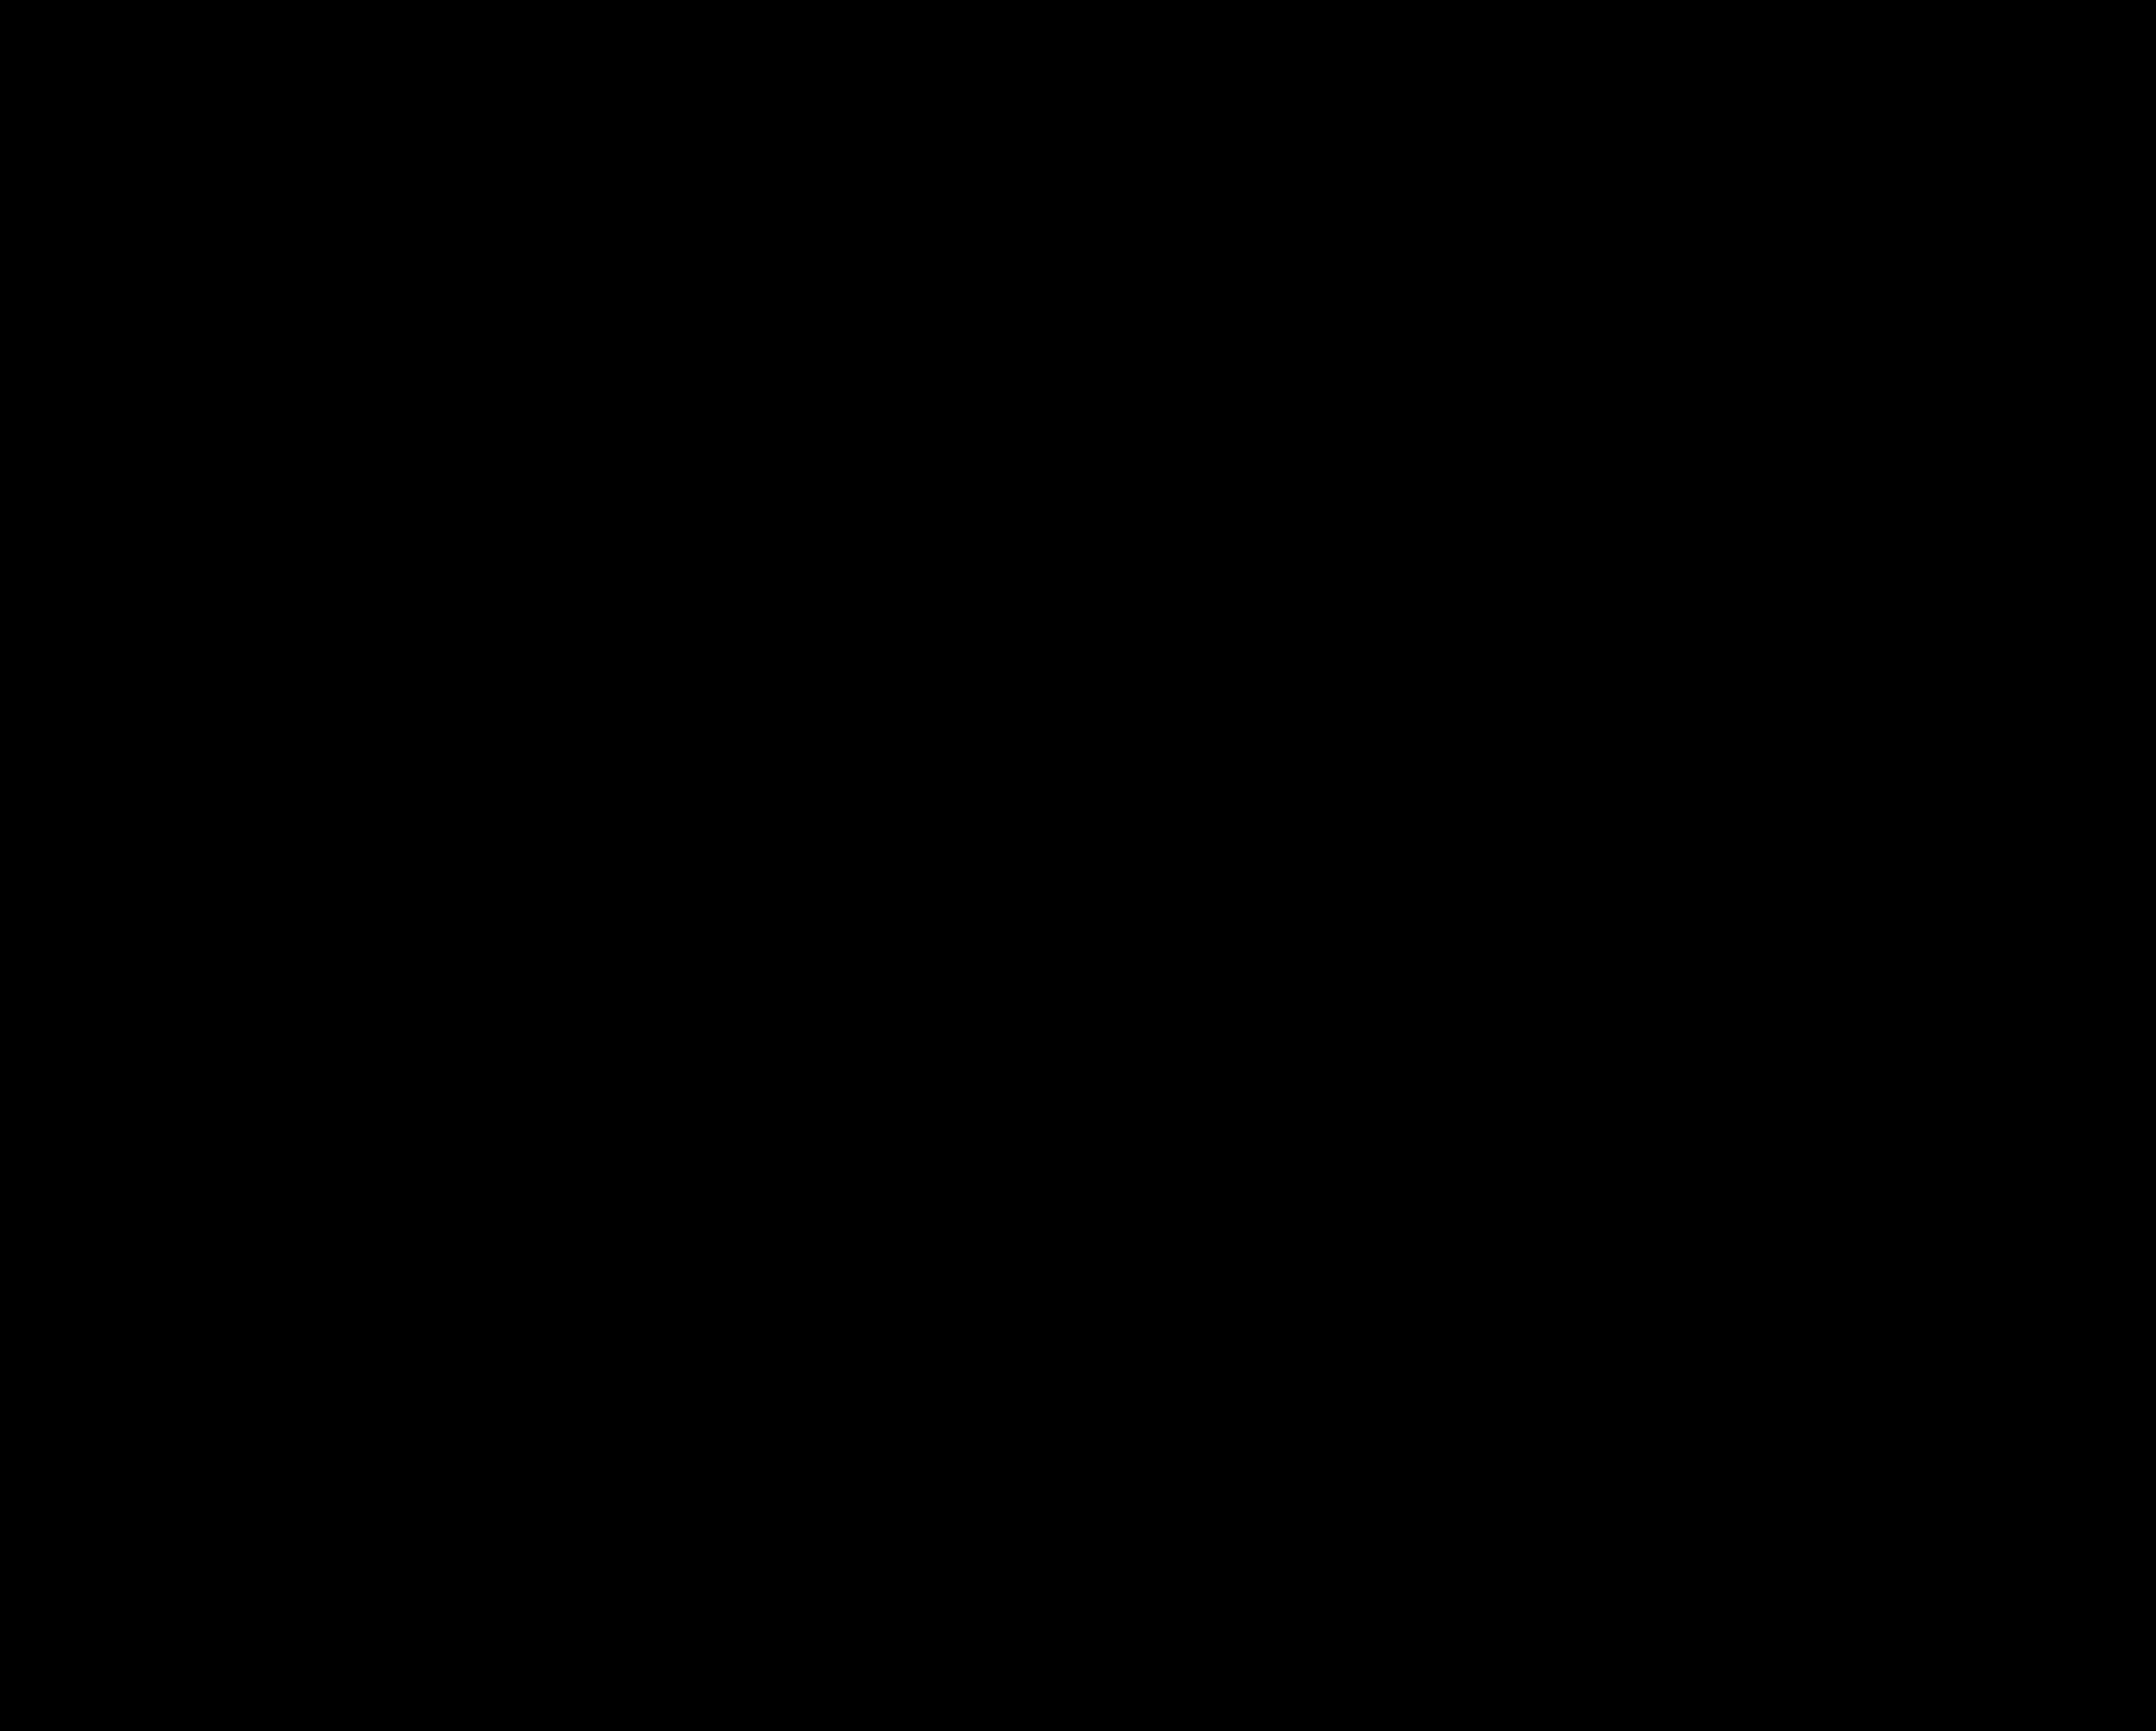 2318x1861 Clipart